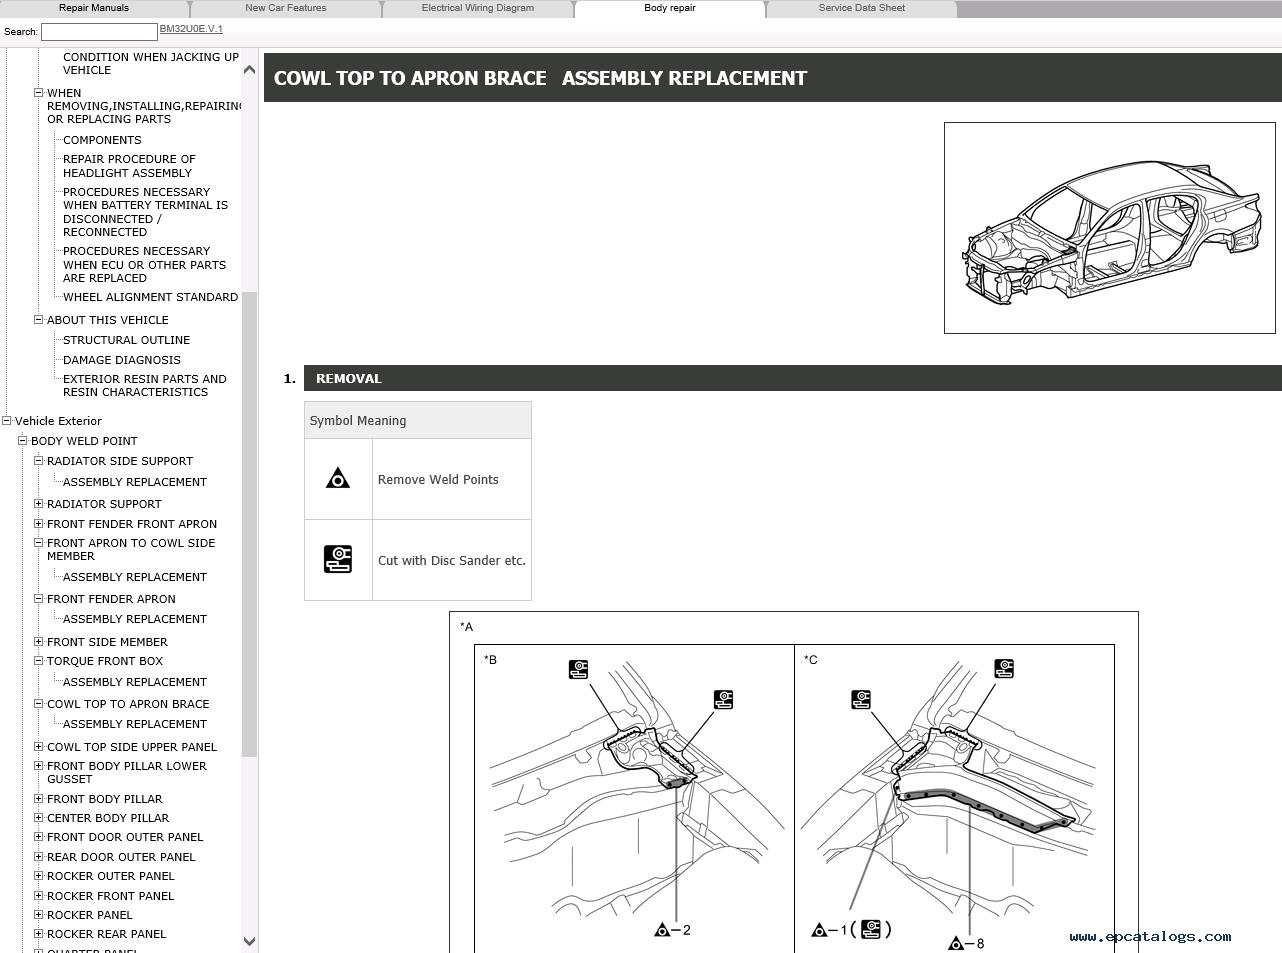 Lexus Gs F Service Manual 10 Download